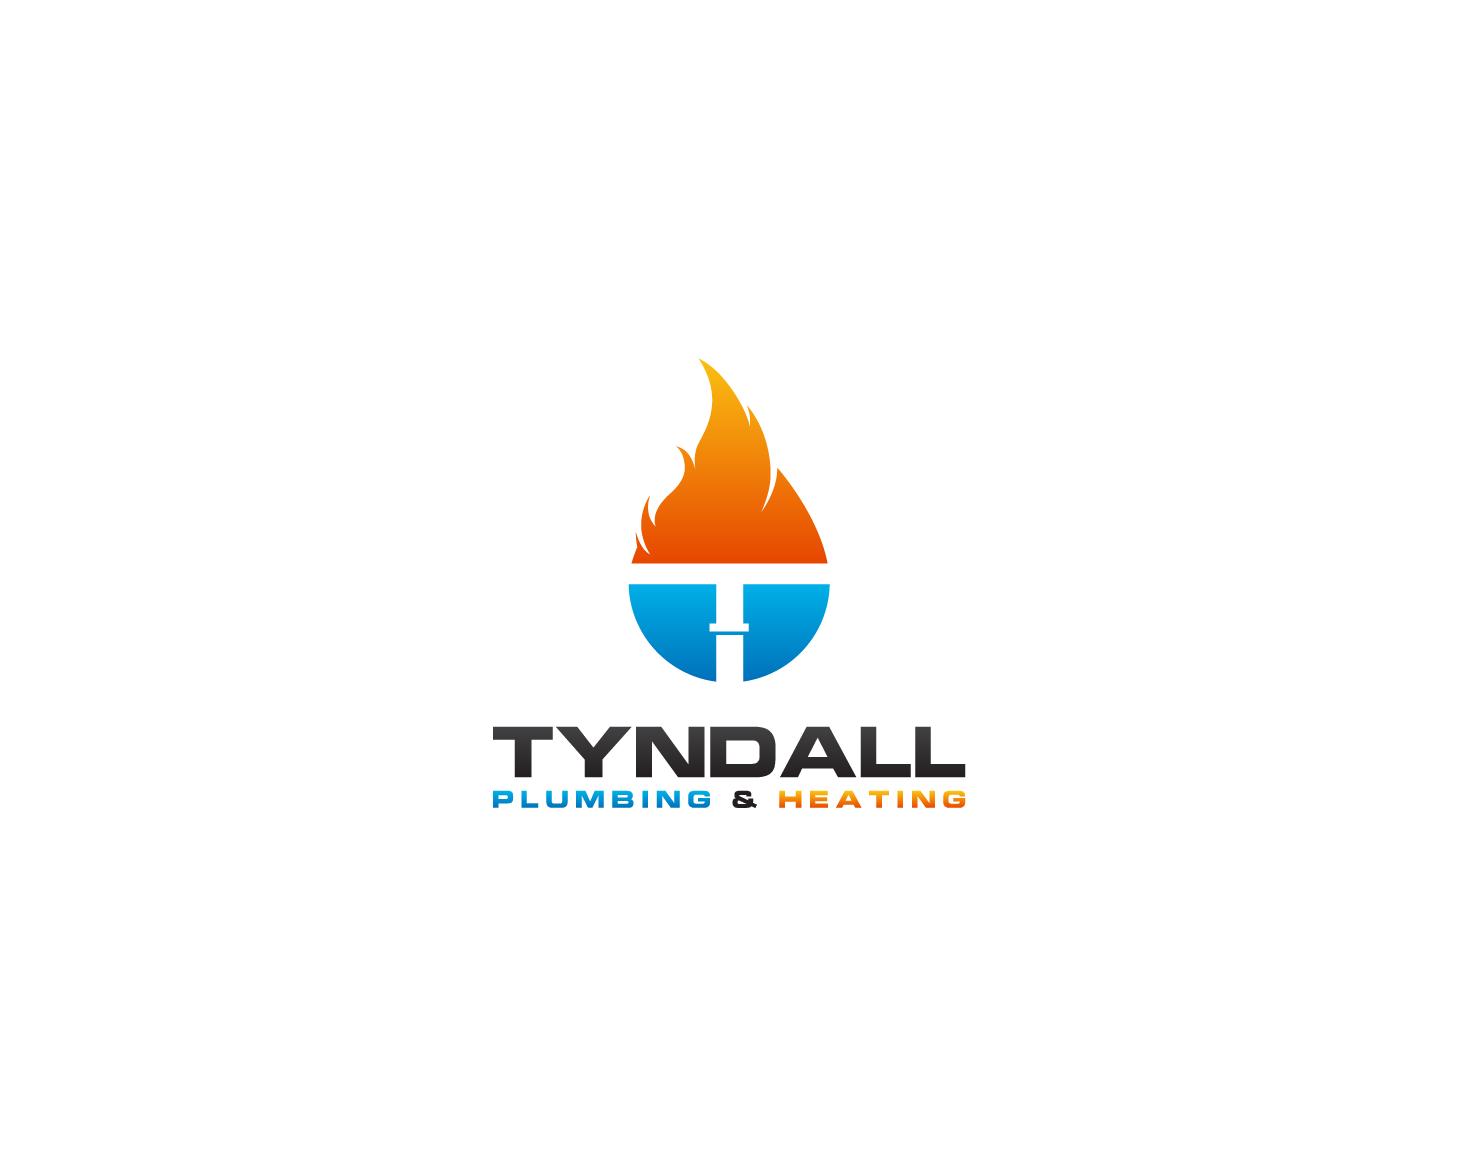 Logo Design by Shivaprasad Sangondimath - Entry No. 9 in the Logo Design Contest Imaginative Logo Design for Tyndall Plumbing & Heating.